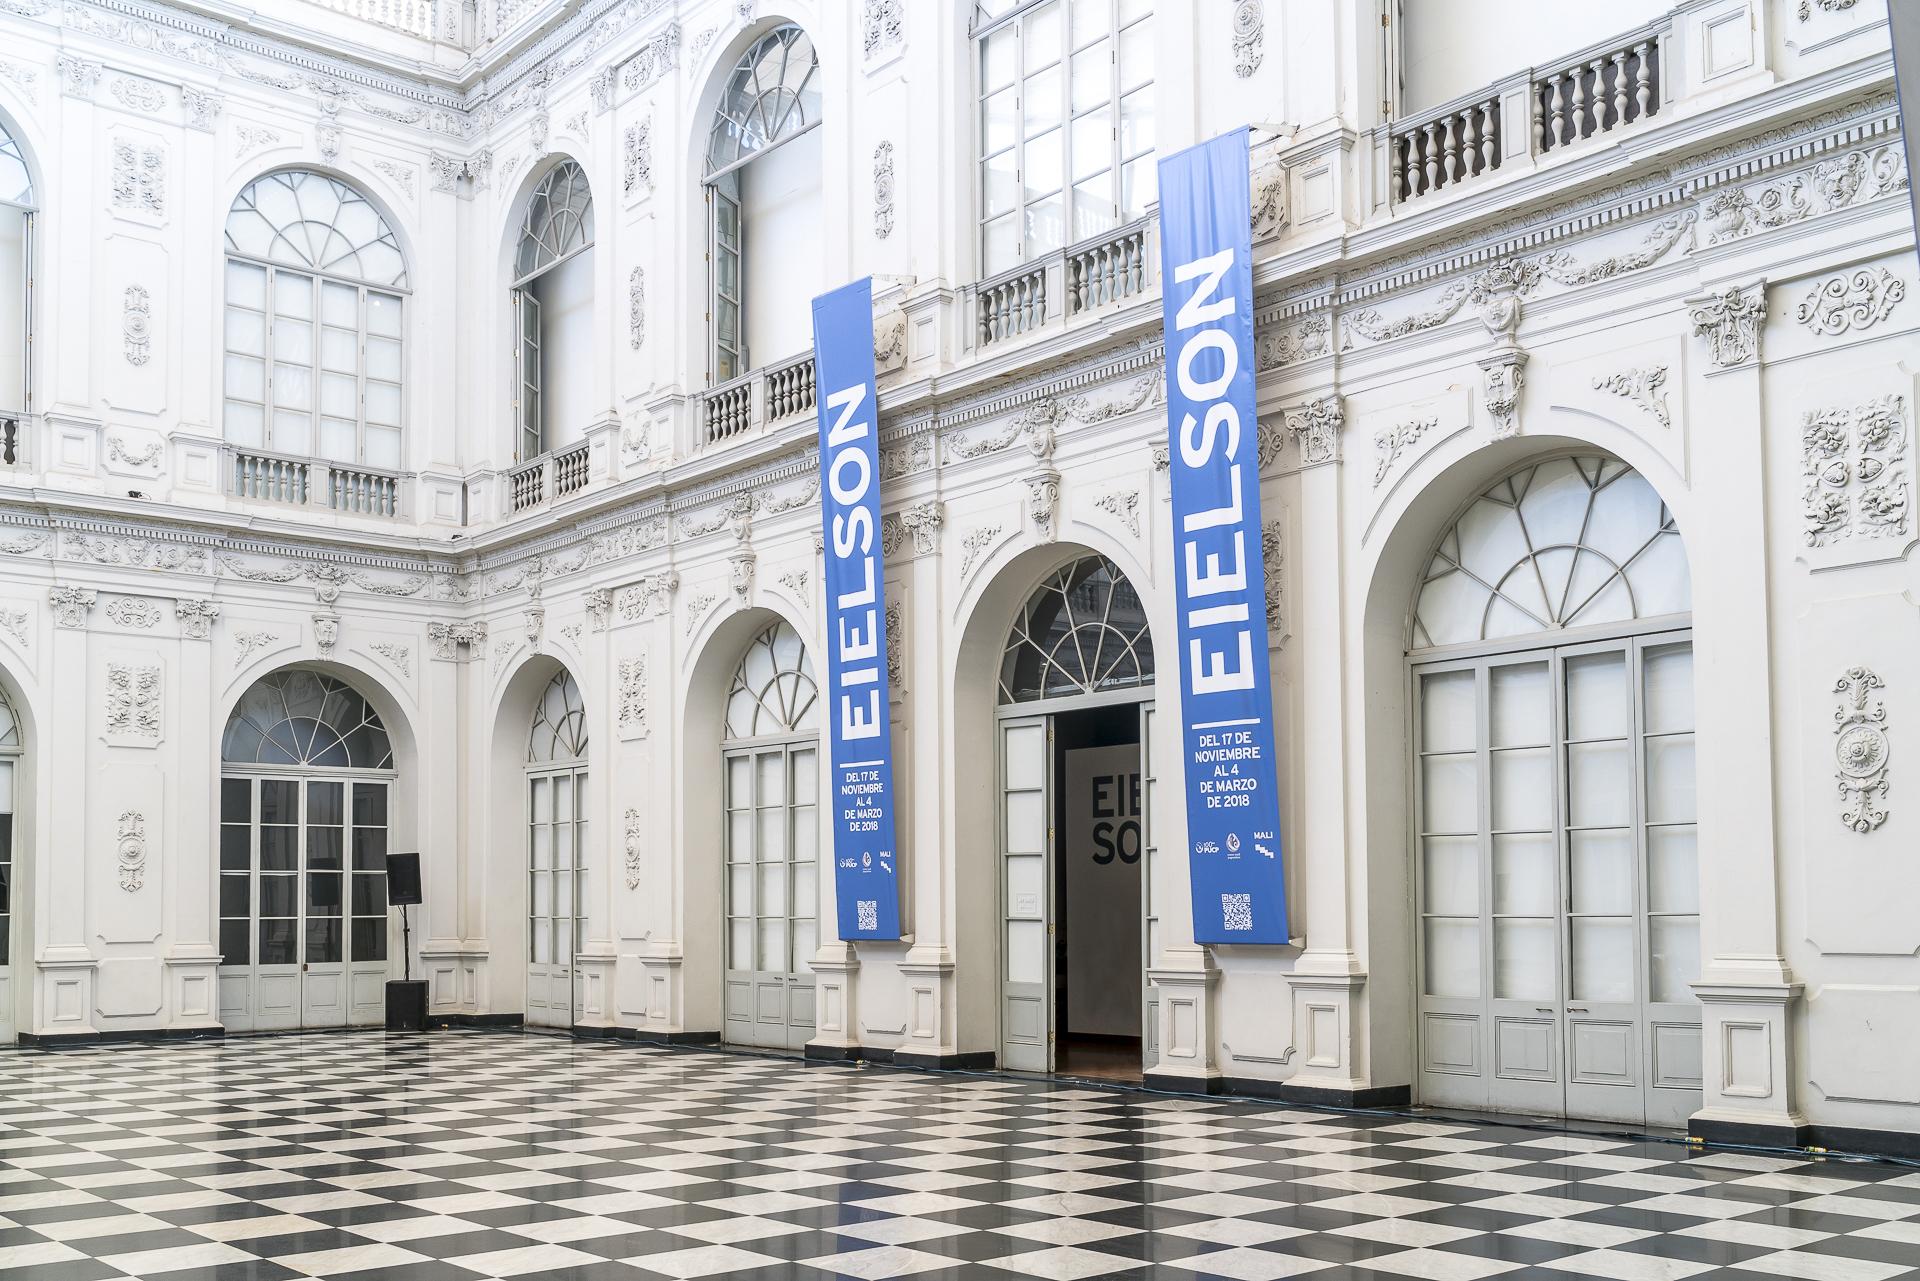 MALI Kunstmuseum Lima